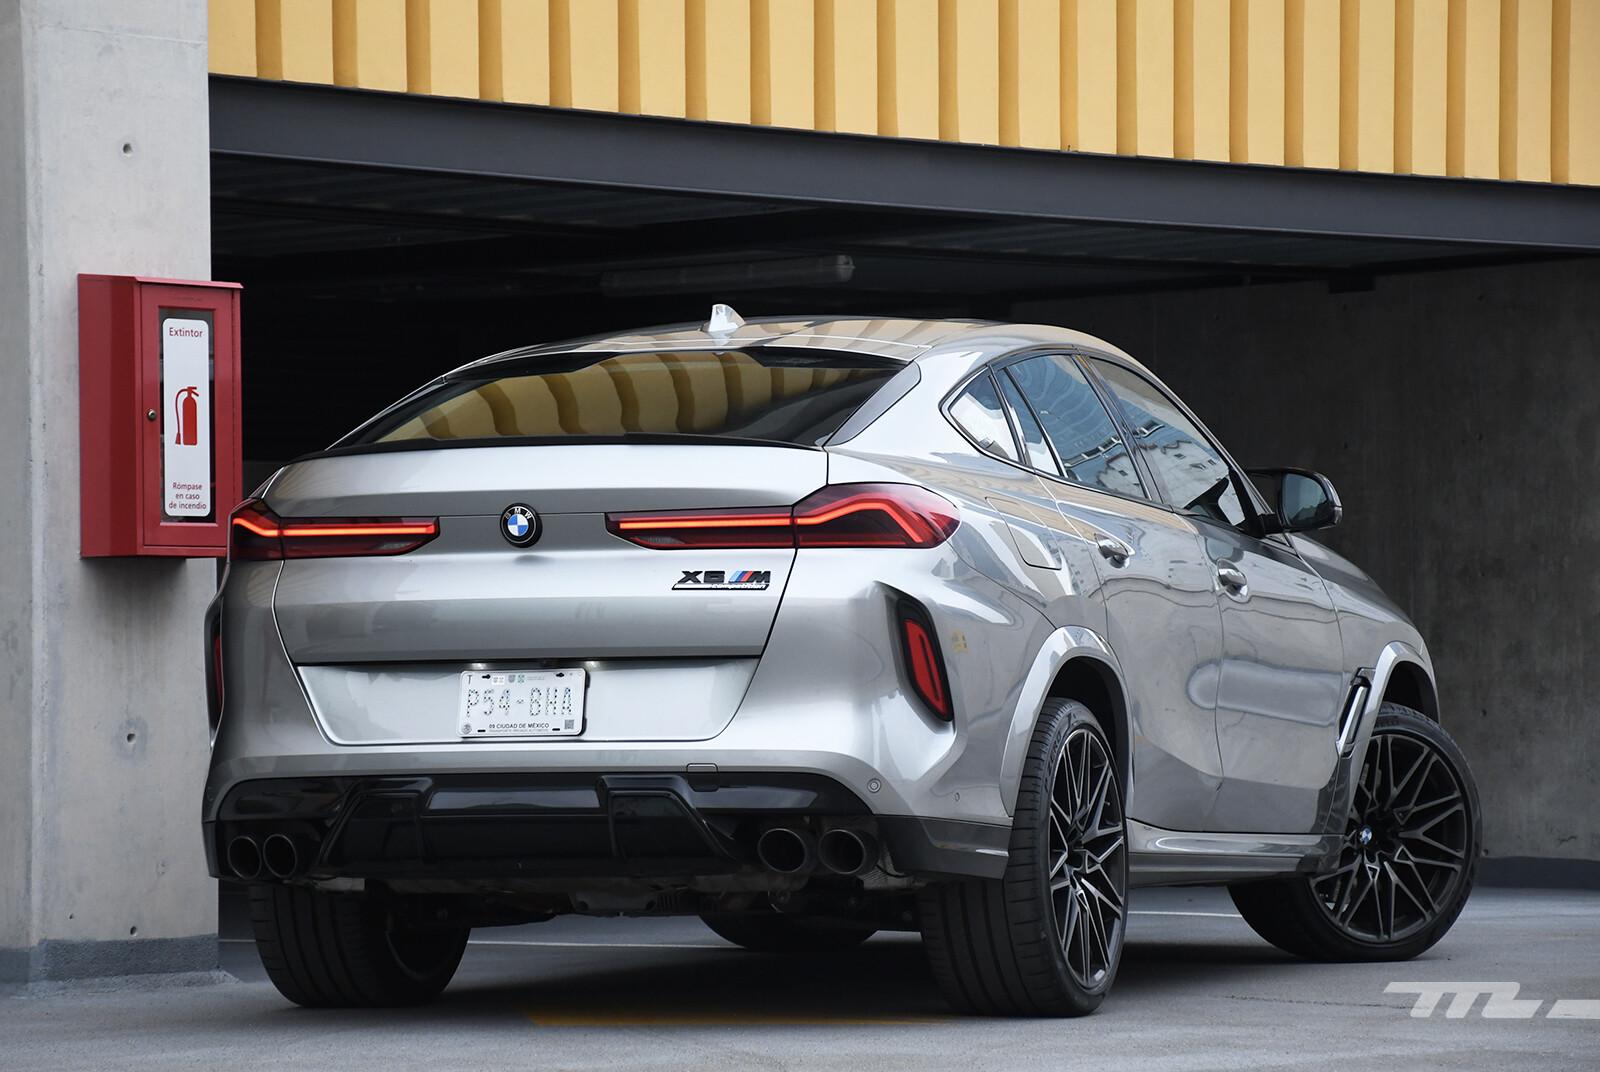 Foto de BMW X6 M Competition 2021 (prueba) (6/27)